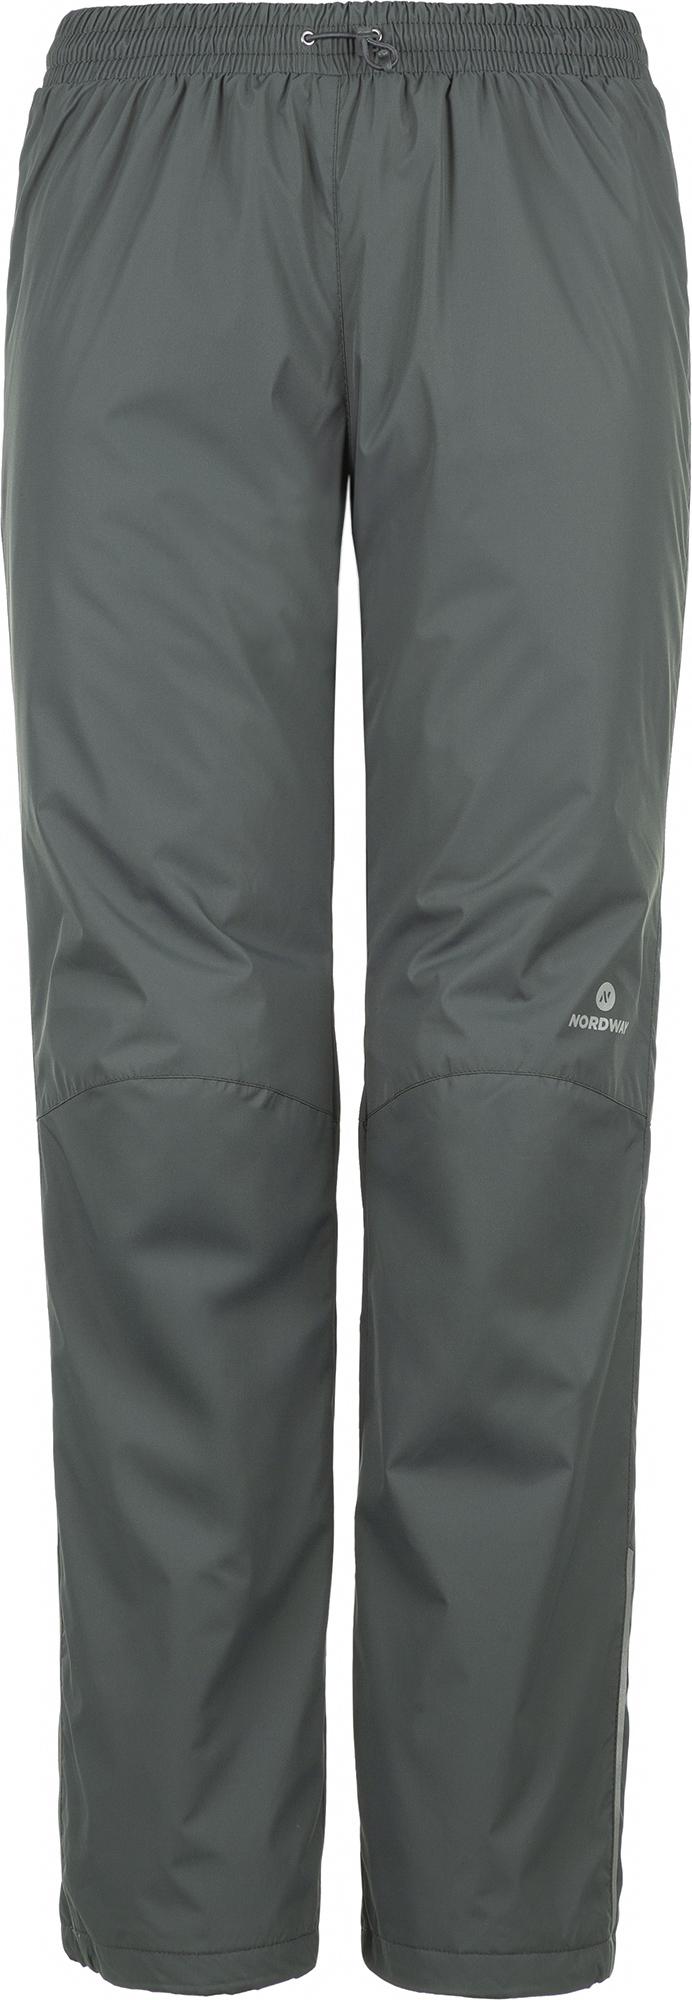 Nordway Брюки утепленные женские Nordway, размер 50 nordway куртка утепленная мужская nordway размер 46